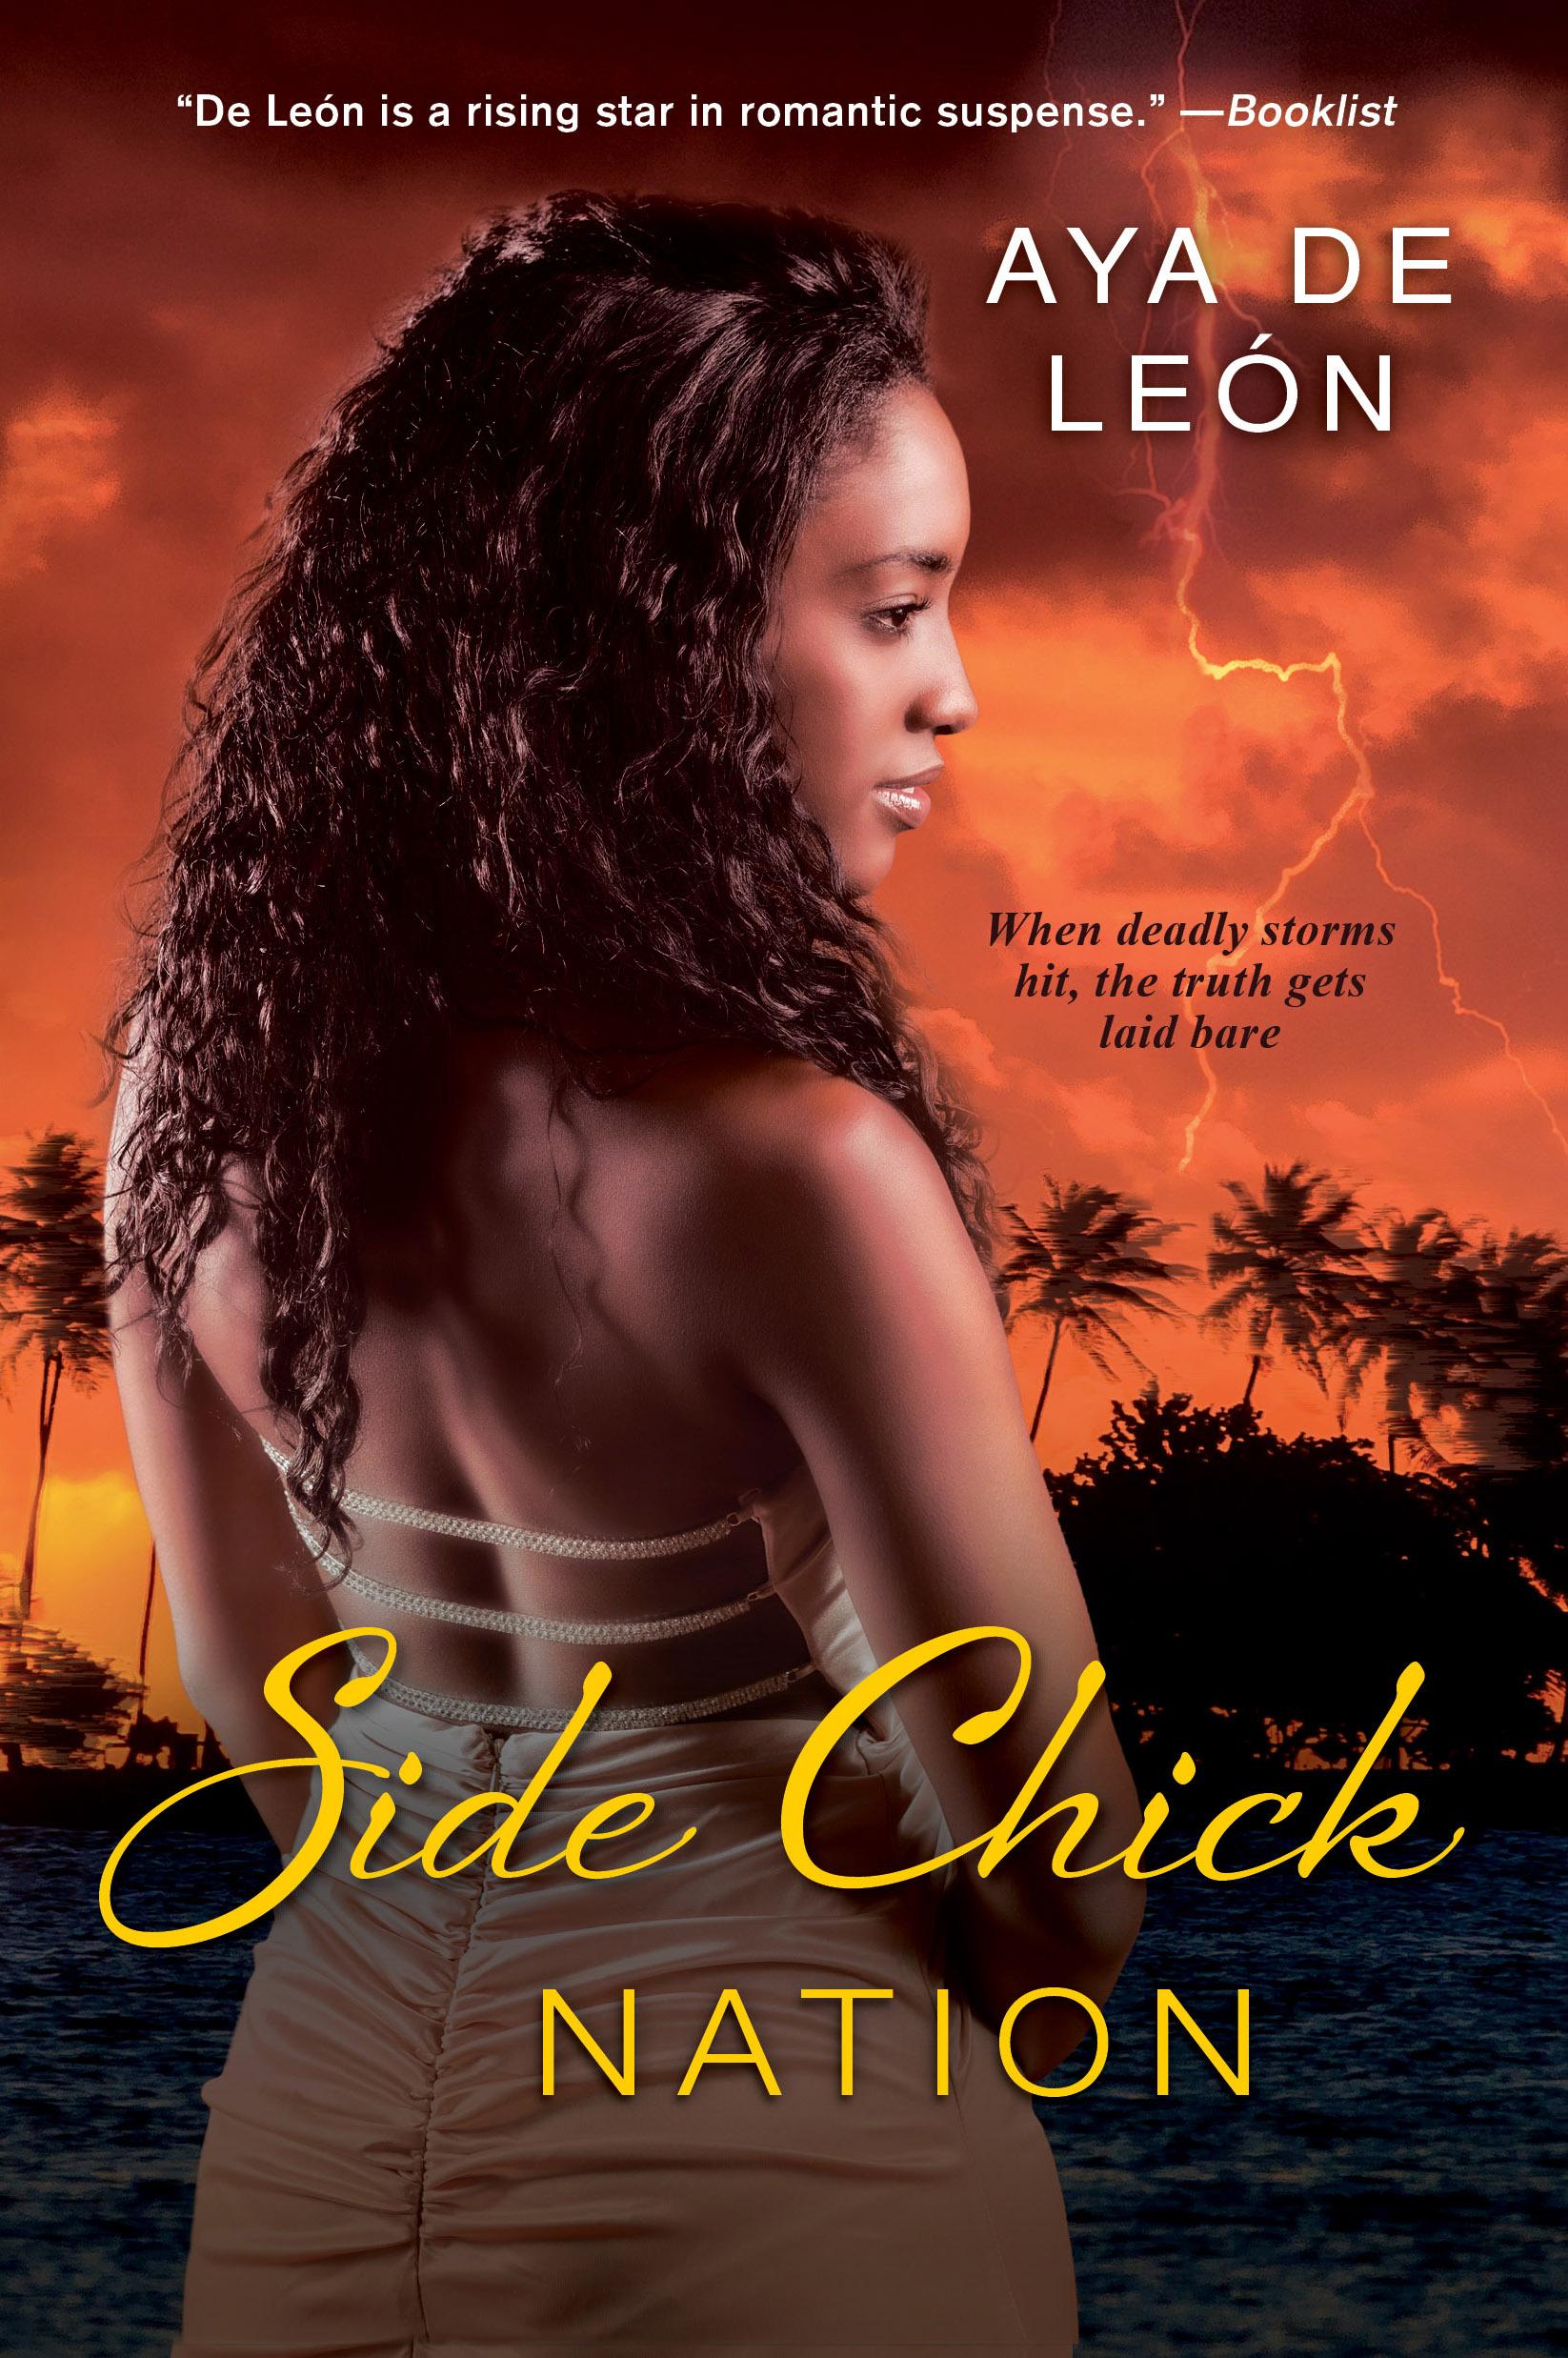 Side Chick Nation_FINAL